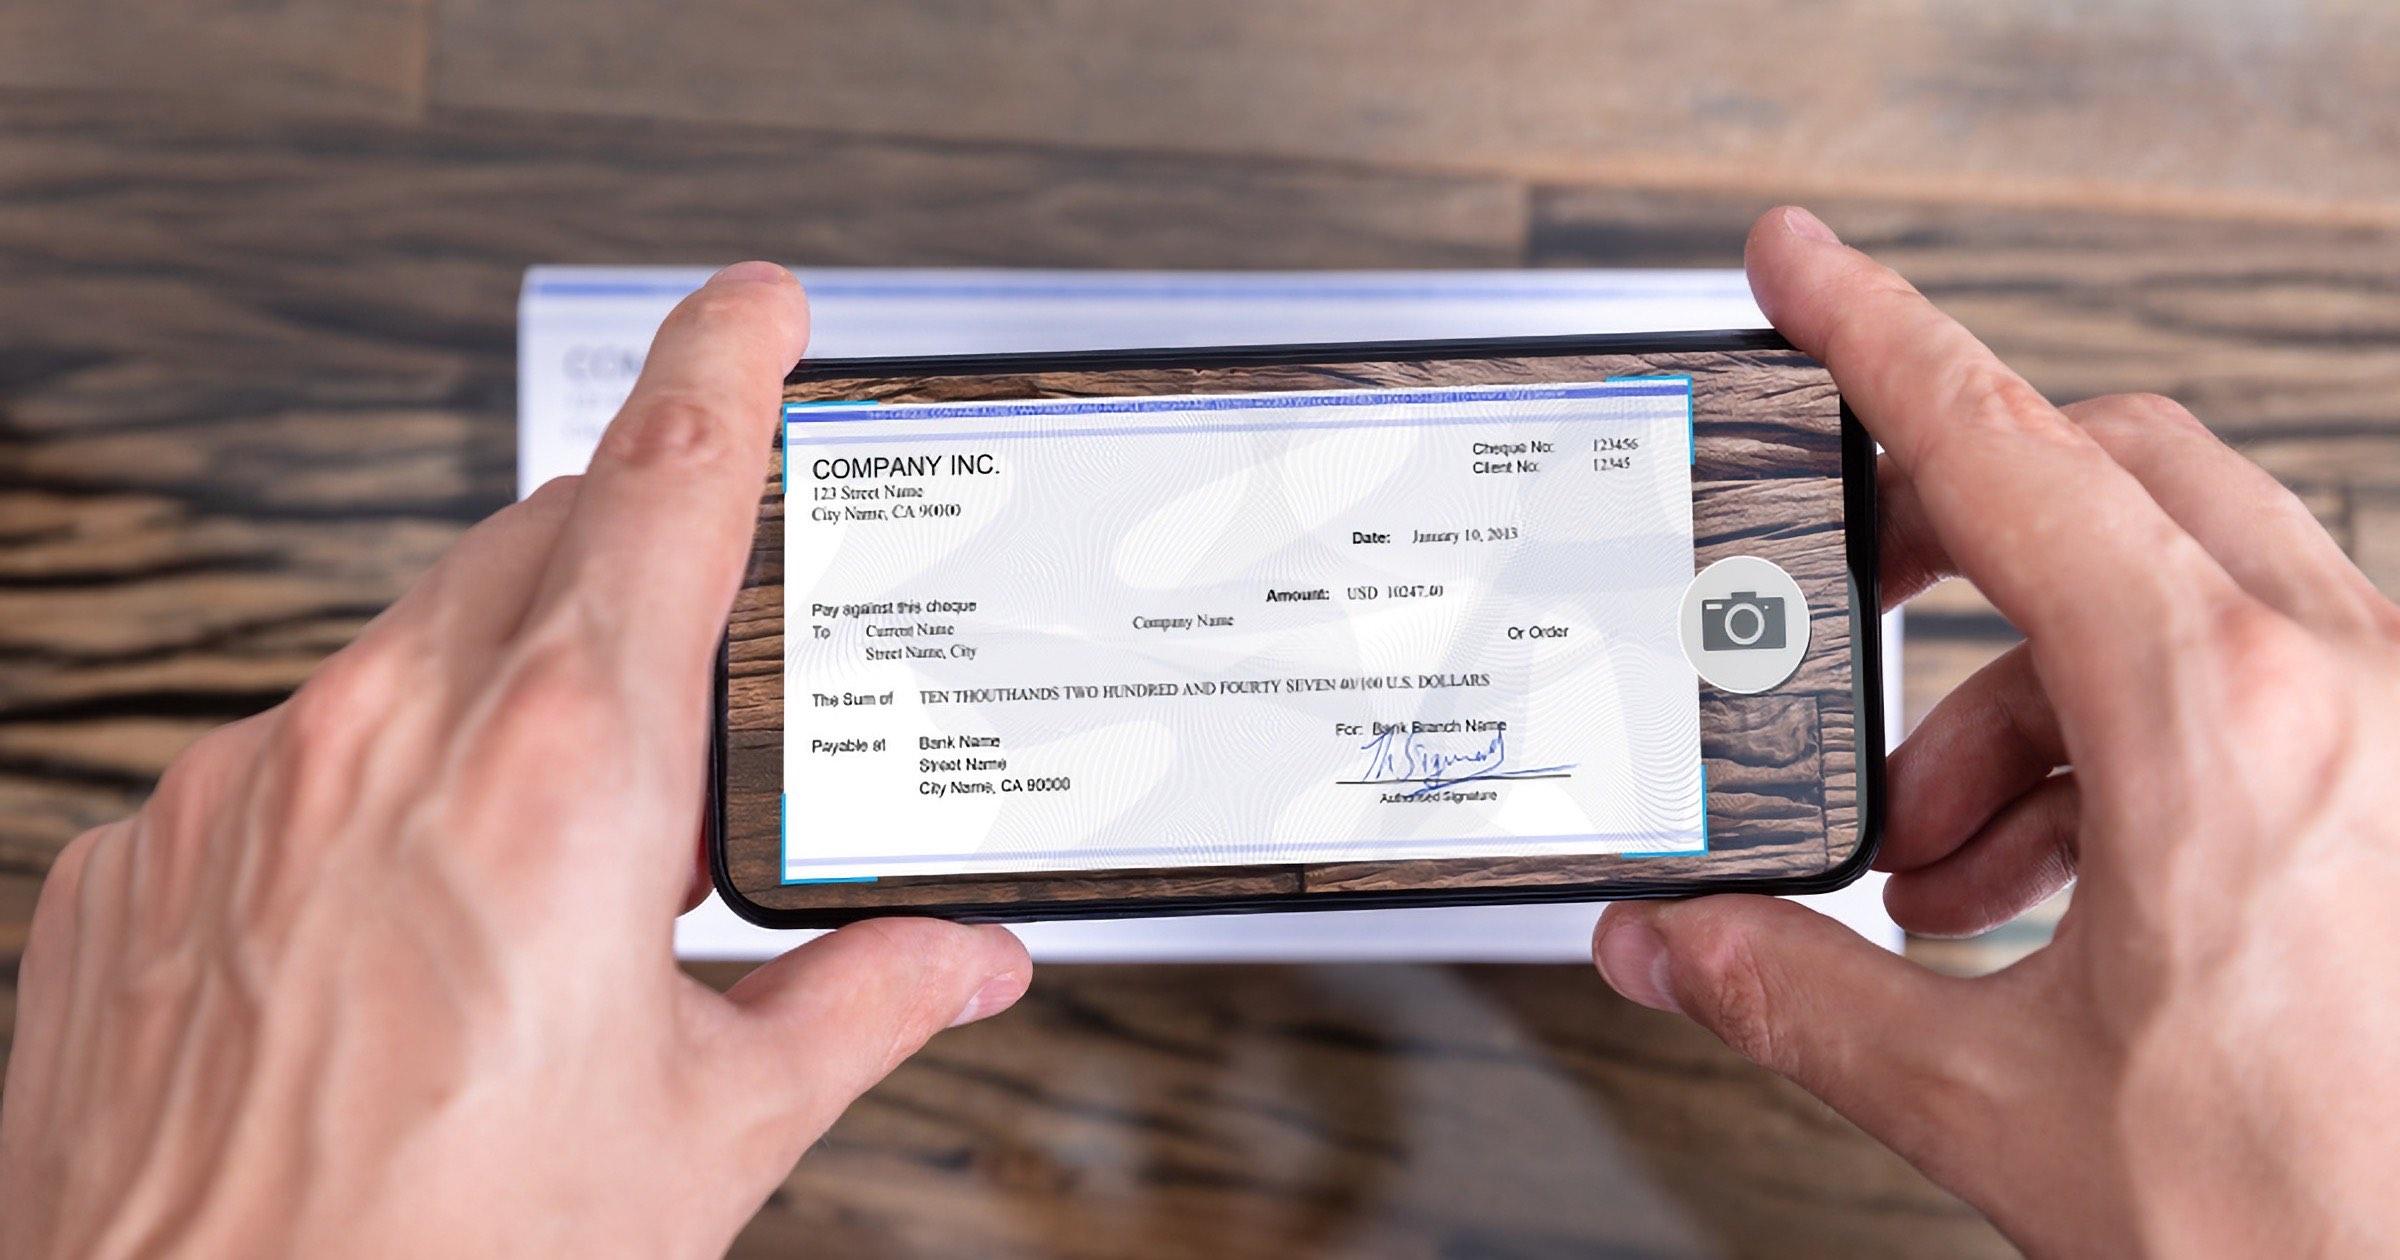 Man cashing check using smartphone